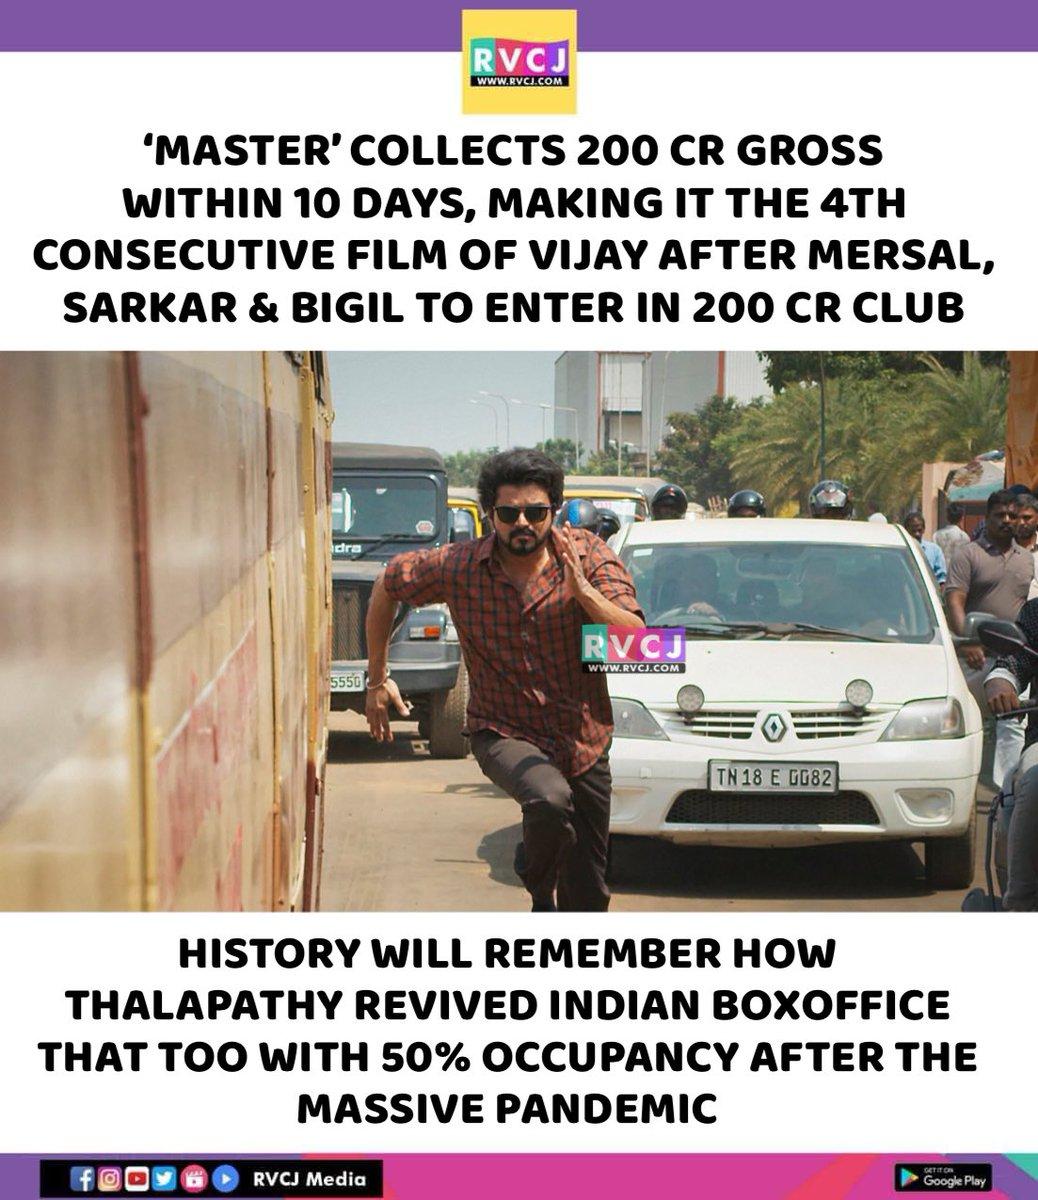 Unstoppable 🔥 @actorvijay @VijaySethuOffl @Dir_Lokesh  #MasterEnters200CrClub #MasterFilm #MasterPongal #VijayTheMaster #ThalapathyVijay #VijaySethupathi #MakkalSelvan #LokeshKanagaraj #Kollywood #TamilCinema #rvcjmovies